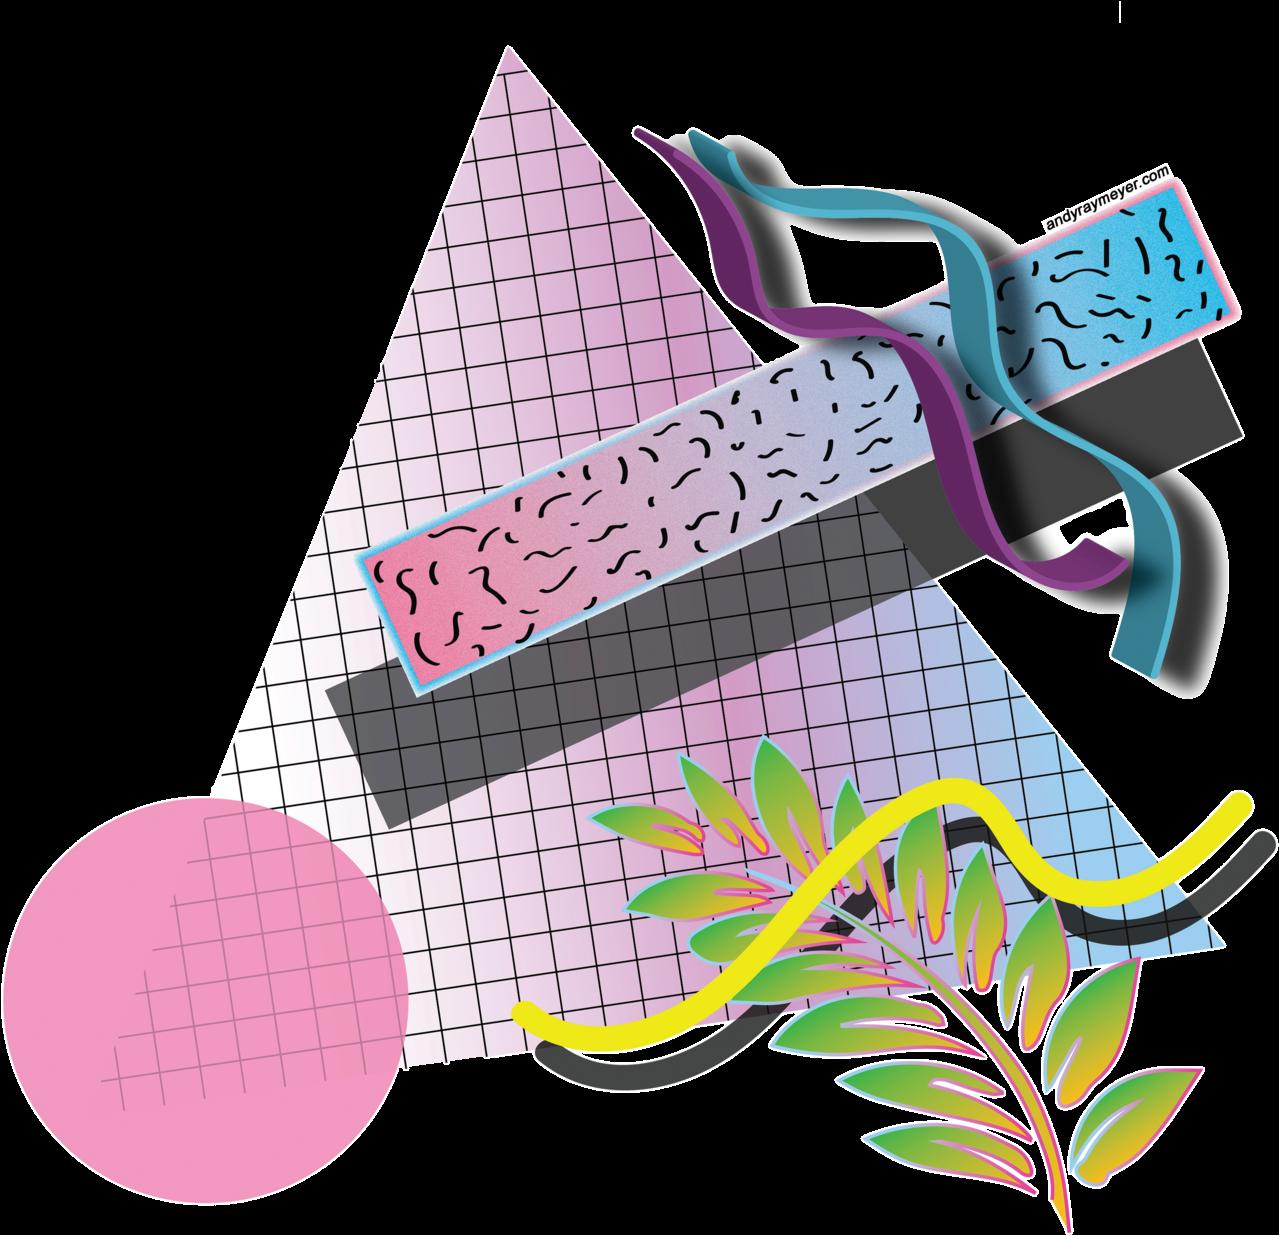 Transparent smooth jazz clipart - Jazz Clipart Smooth Jazz - Vaporwave Aesthetic Tumblr Png